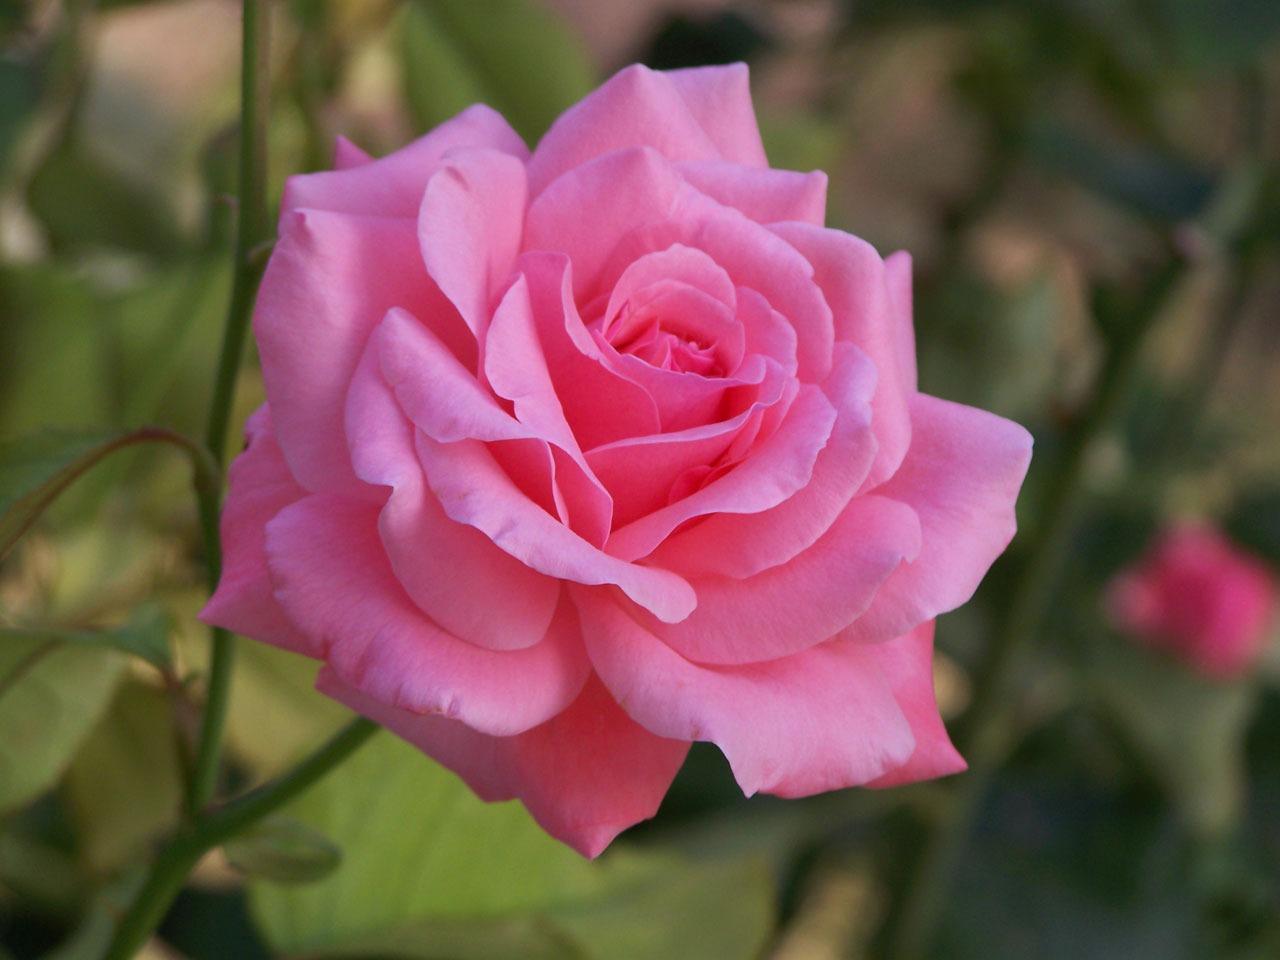 short essay on favorite flower rose